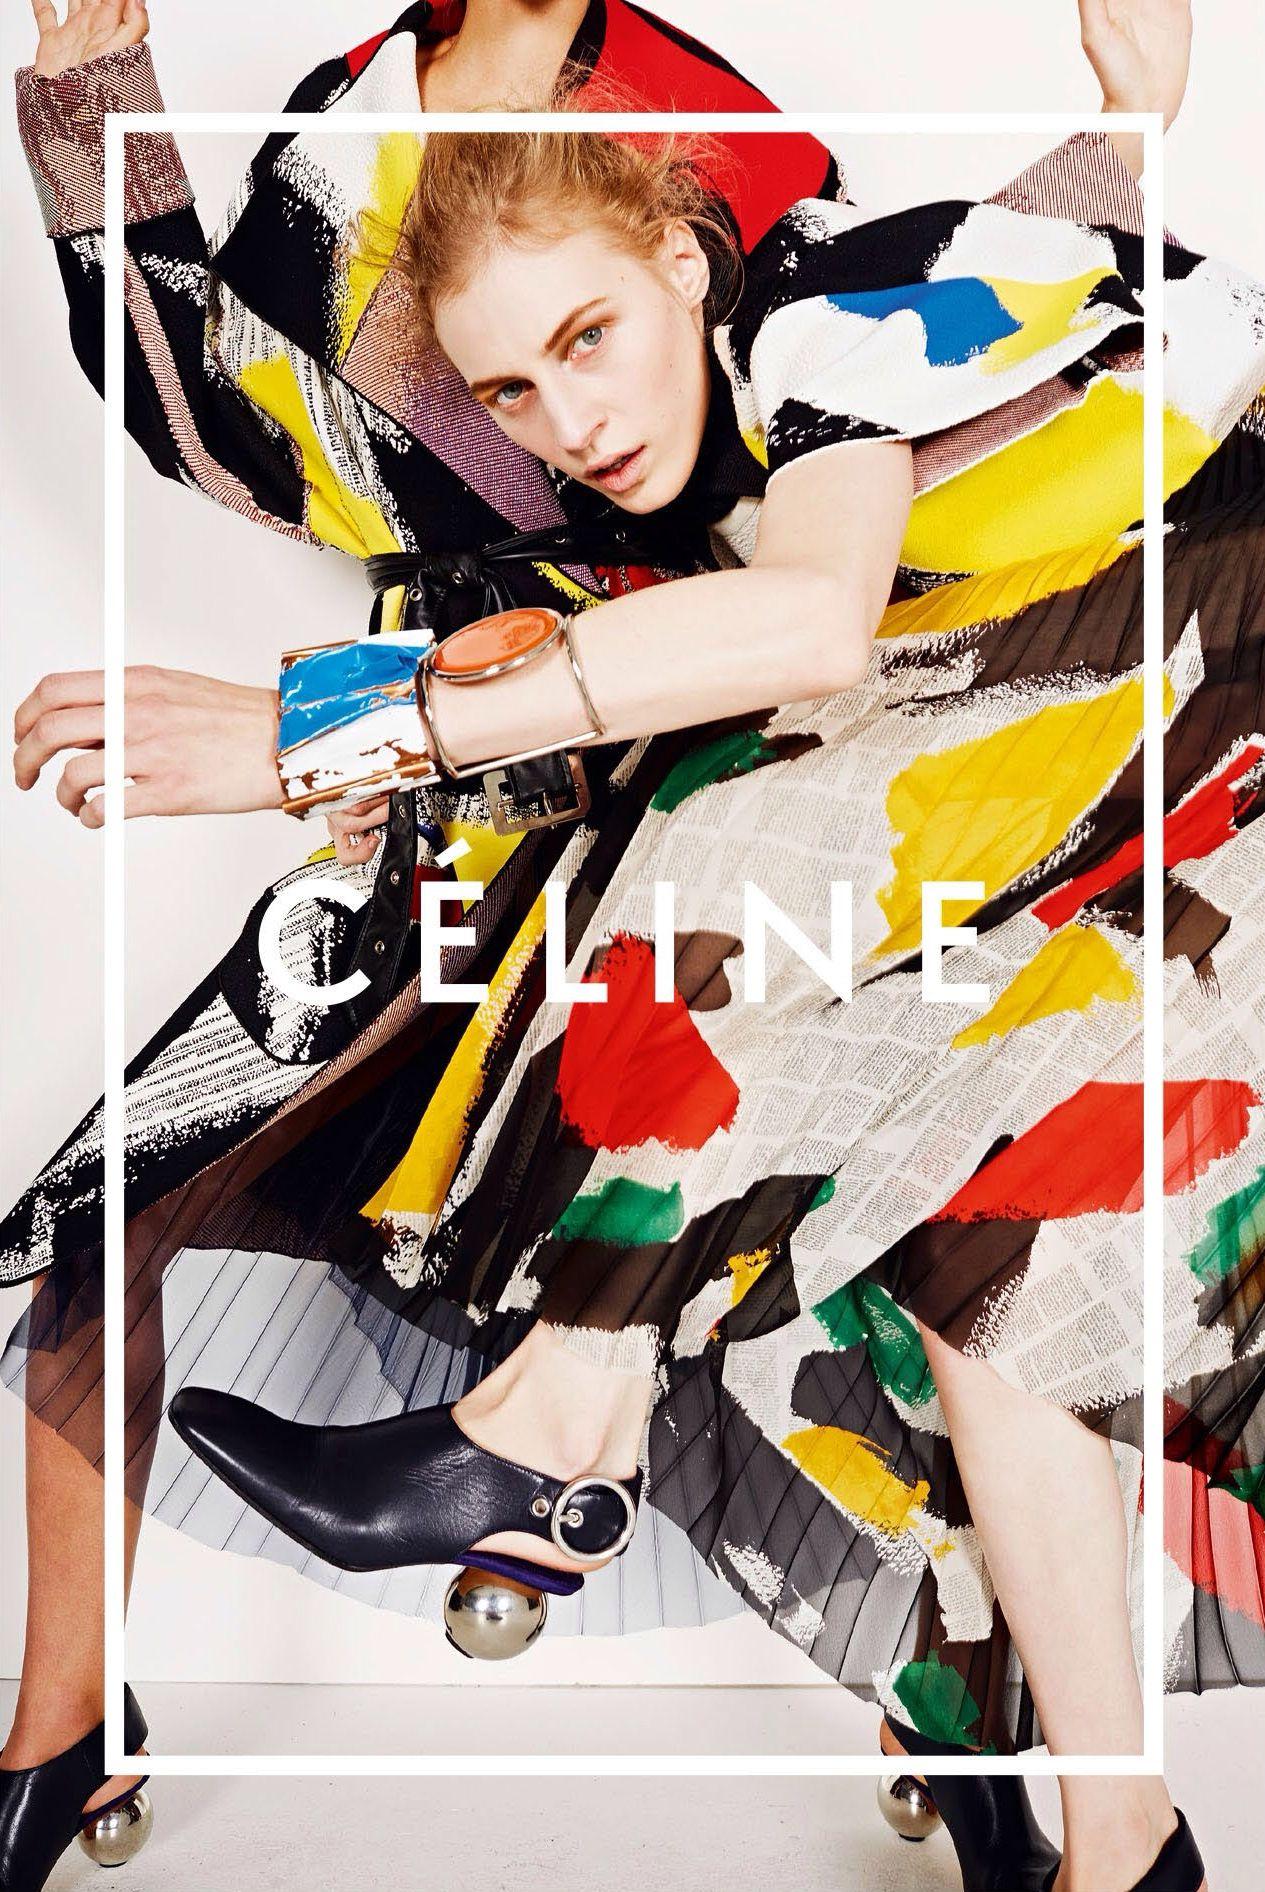 aa732357ddd3 Celine SS14 Campaign by Juergen Teller Valentino